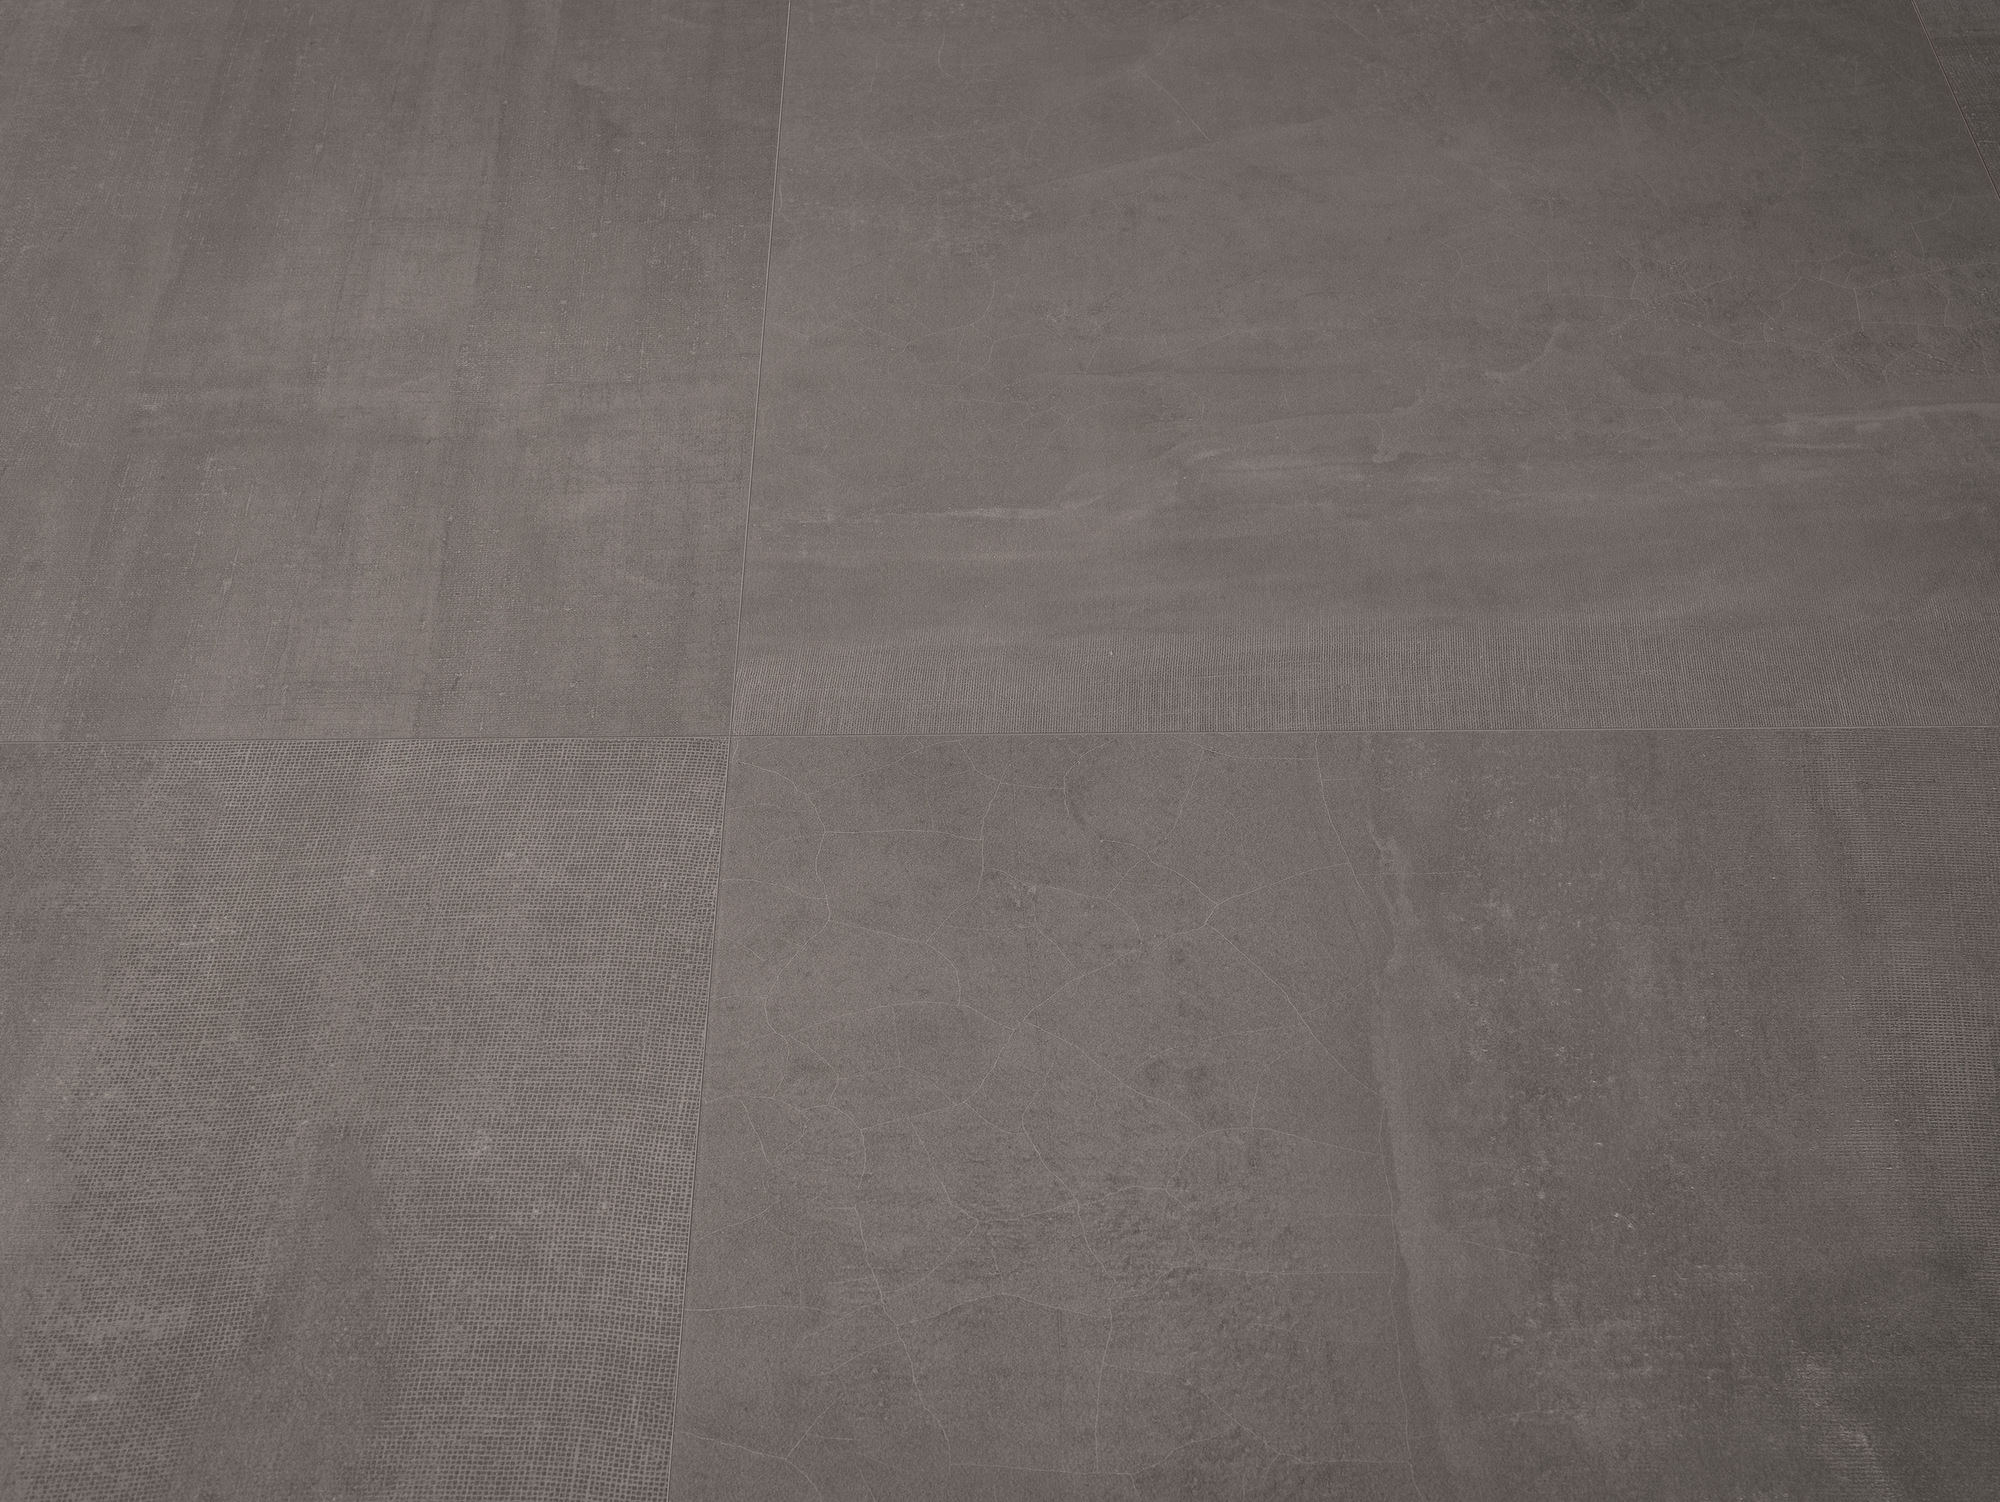 Ge Sso Login Indoor Porcelain Stoneware Wall Floor Tiles Gesso Velvet Black